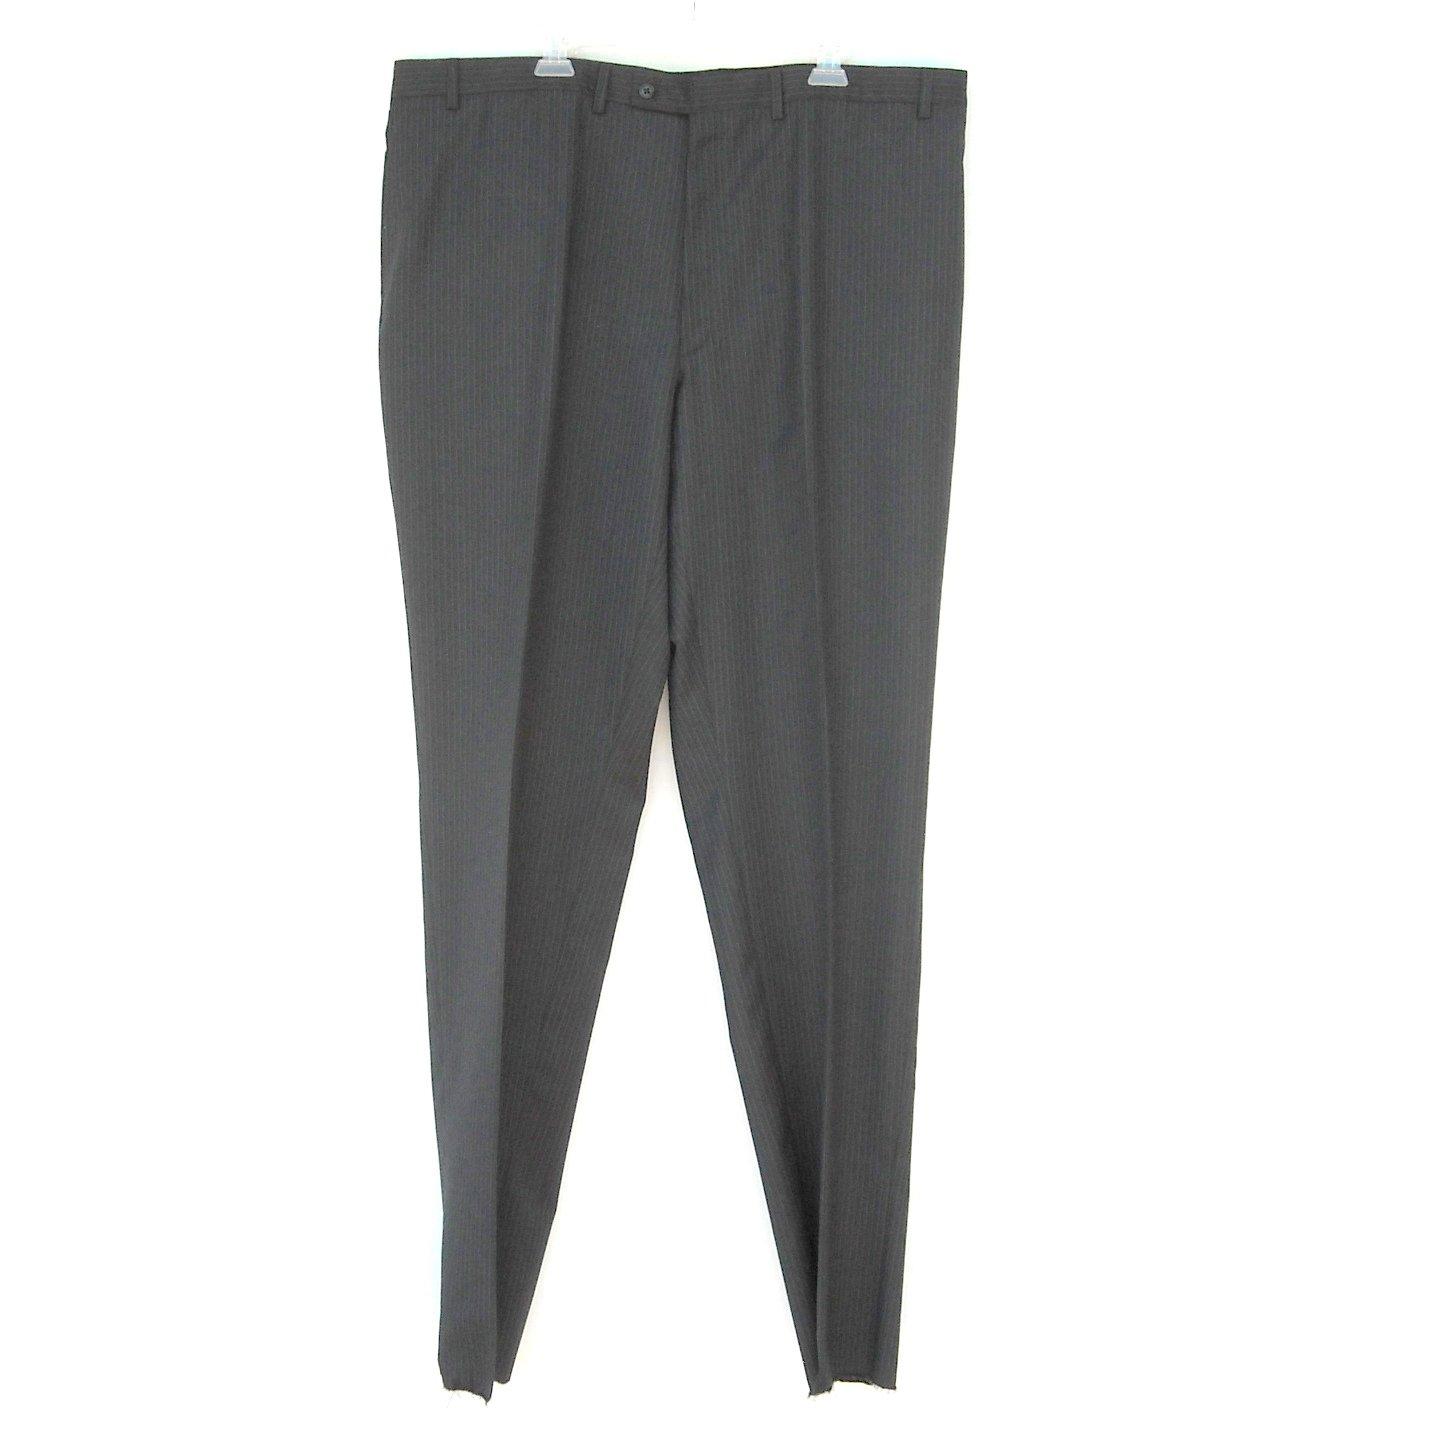 Alfani Charcoal Stripes Unhemmed Pants Size 44 NWT